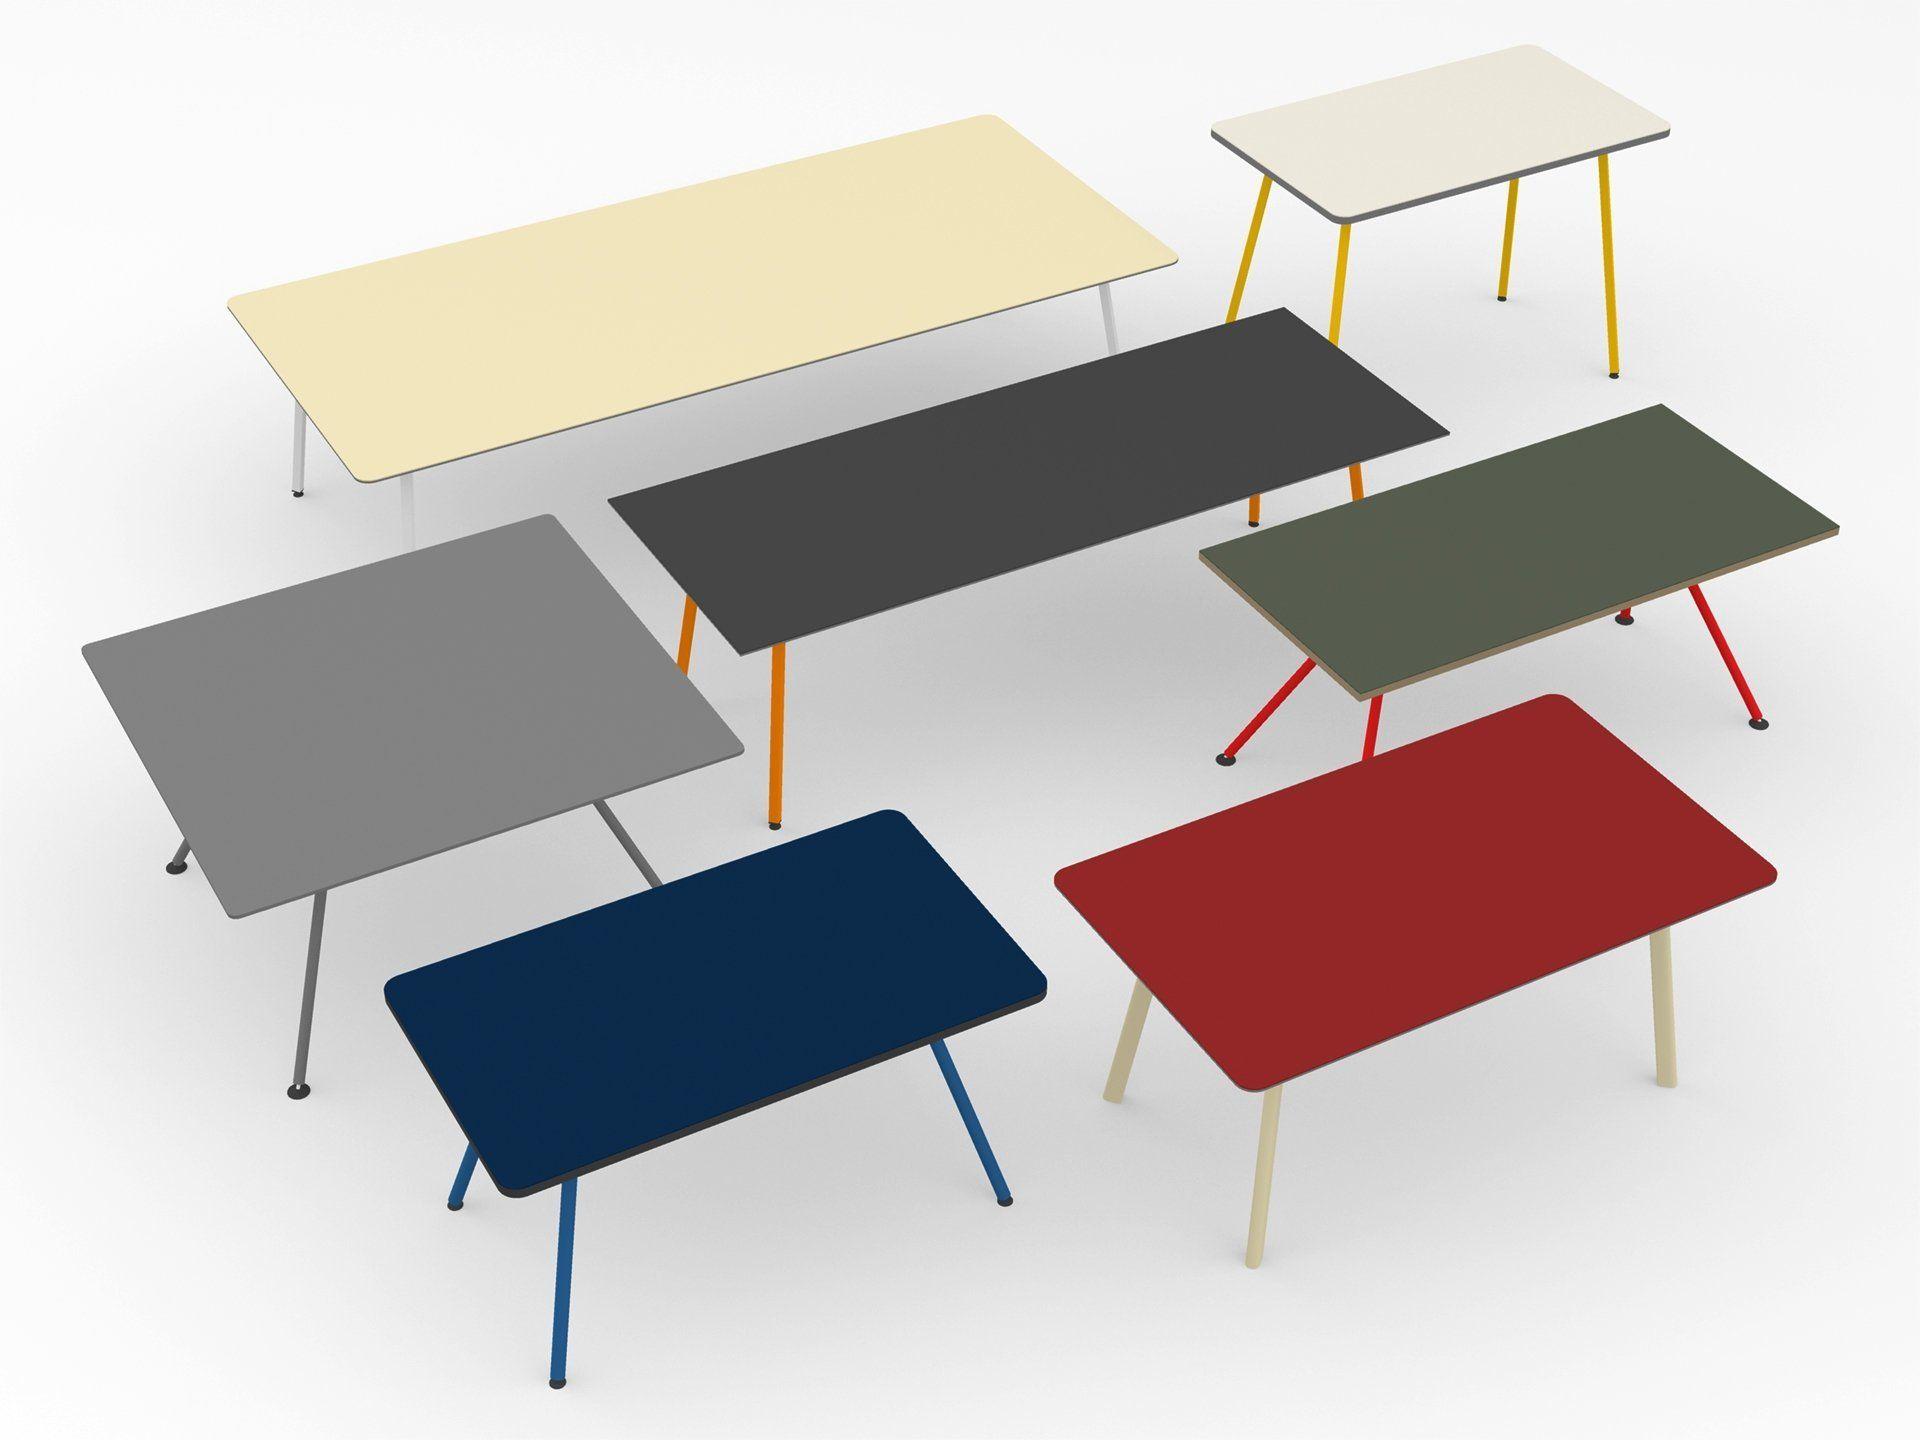 a5ffedc54e3ce6566e64c55d530477cb Luxe De Pied De Table Basse Ikea Schème